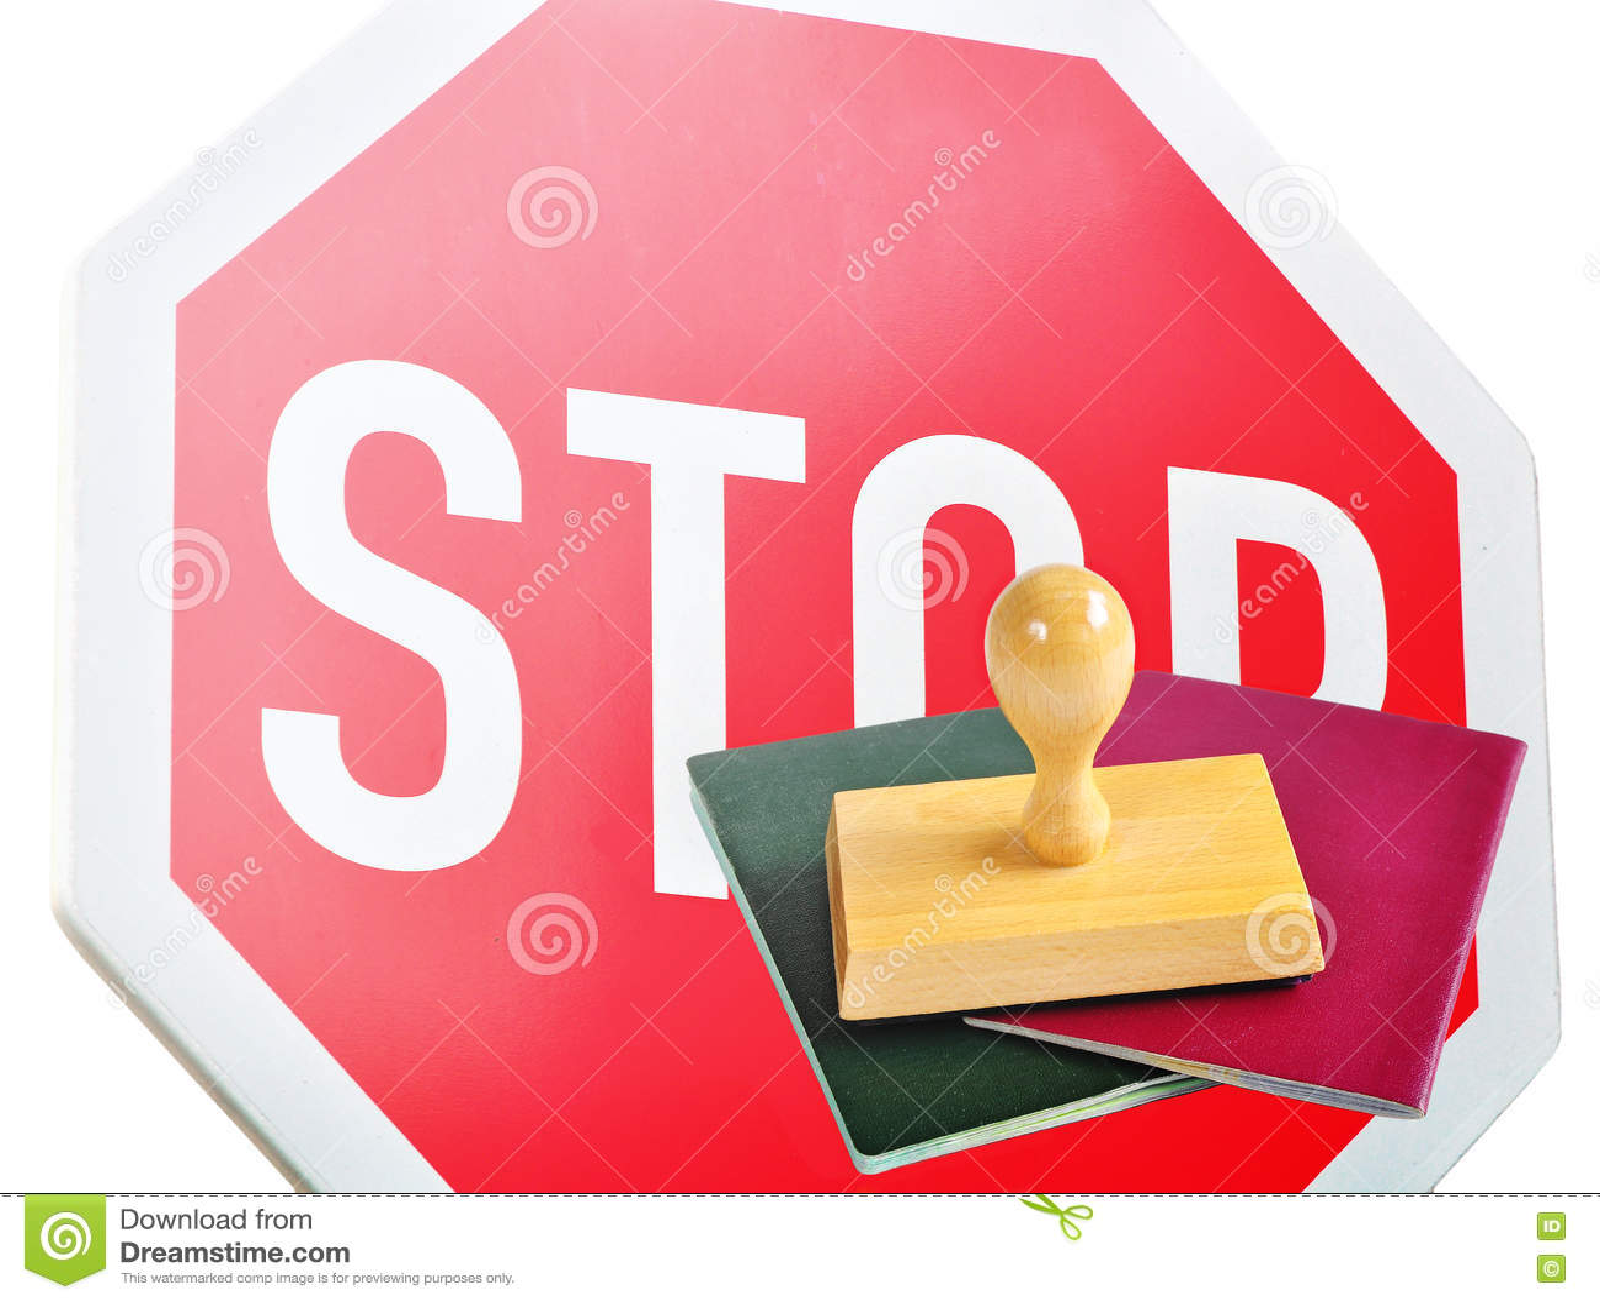 Stop migration refugees stock image image of travel 76401159 royalty free stock photo biocorpaavc Choice Image